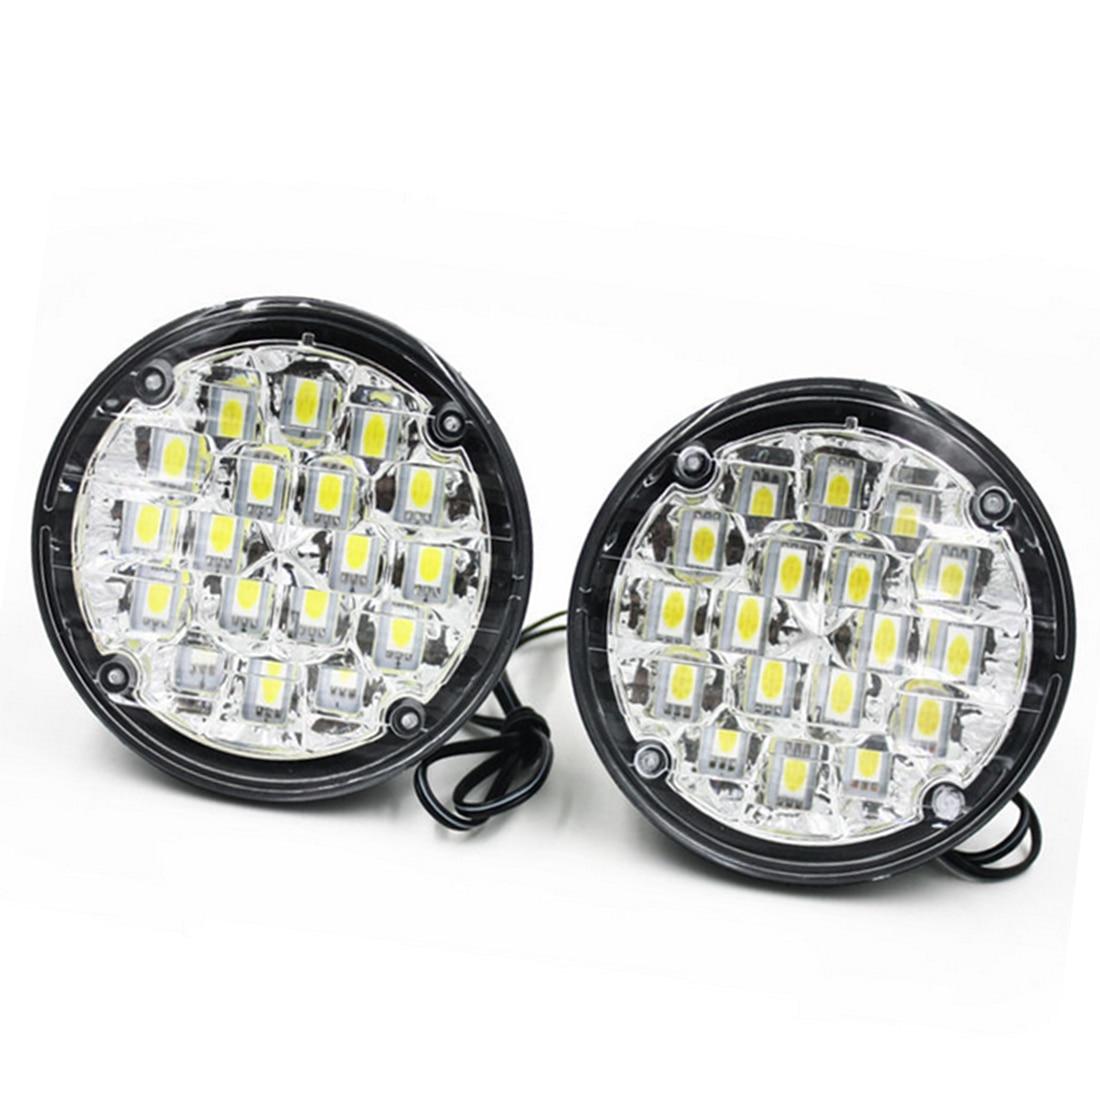 Tonewan super offer 2Pcs 12V 18 LED Round Car Driving Daytime Running Light DRL Fog font